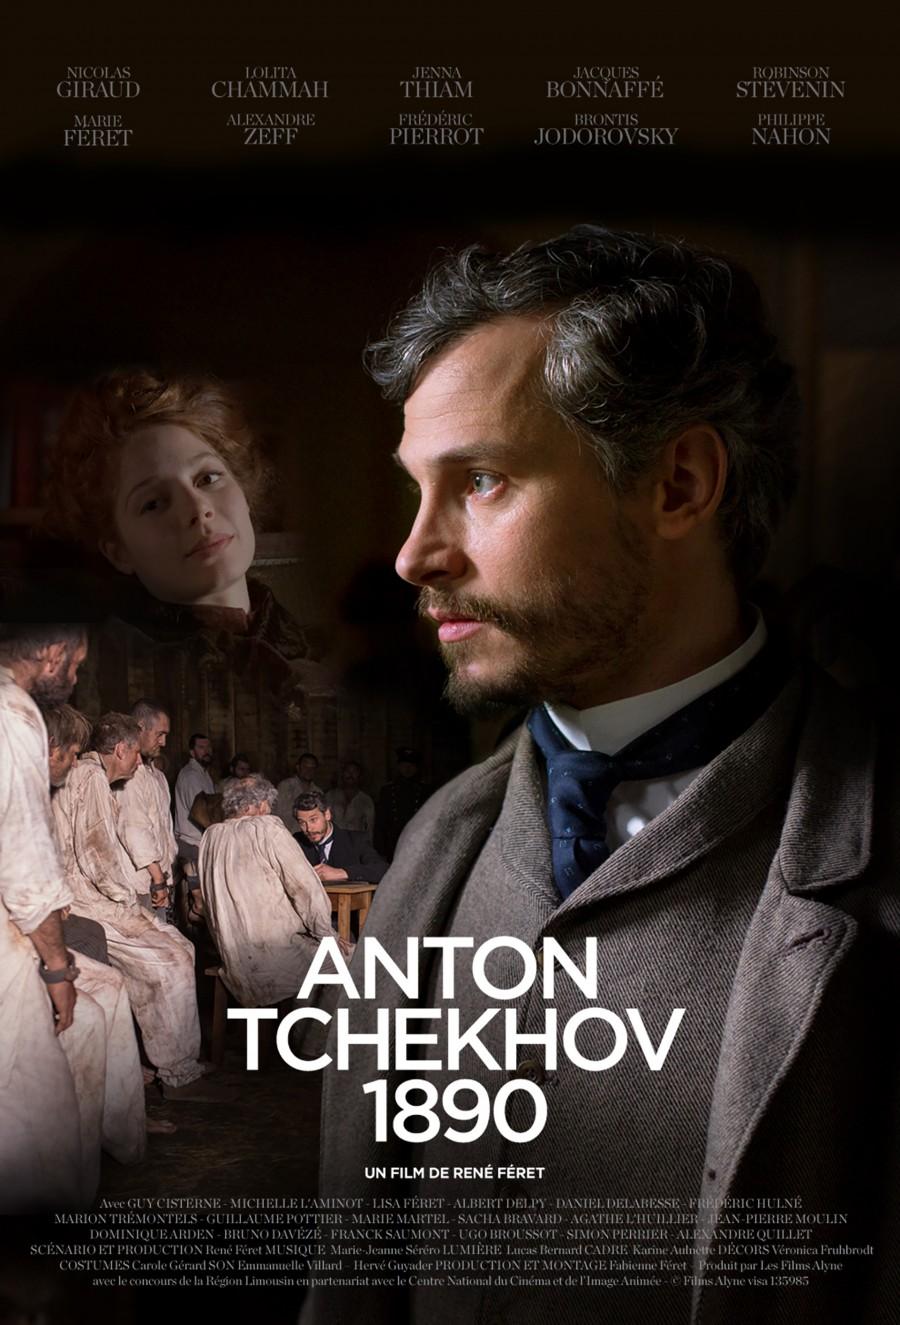 Постер к фильму «Антон Чехов 1890» (2015) / реж. Рене Фере